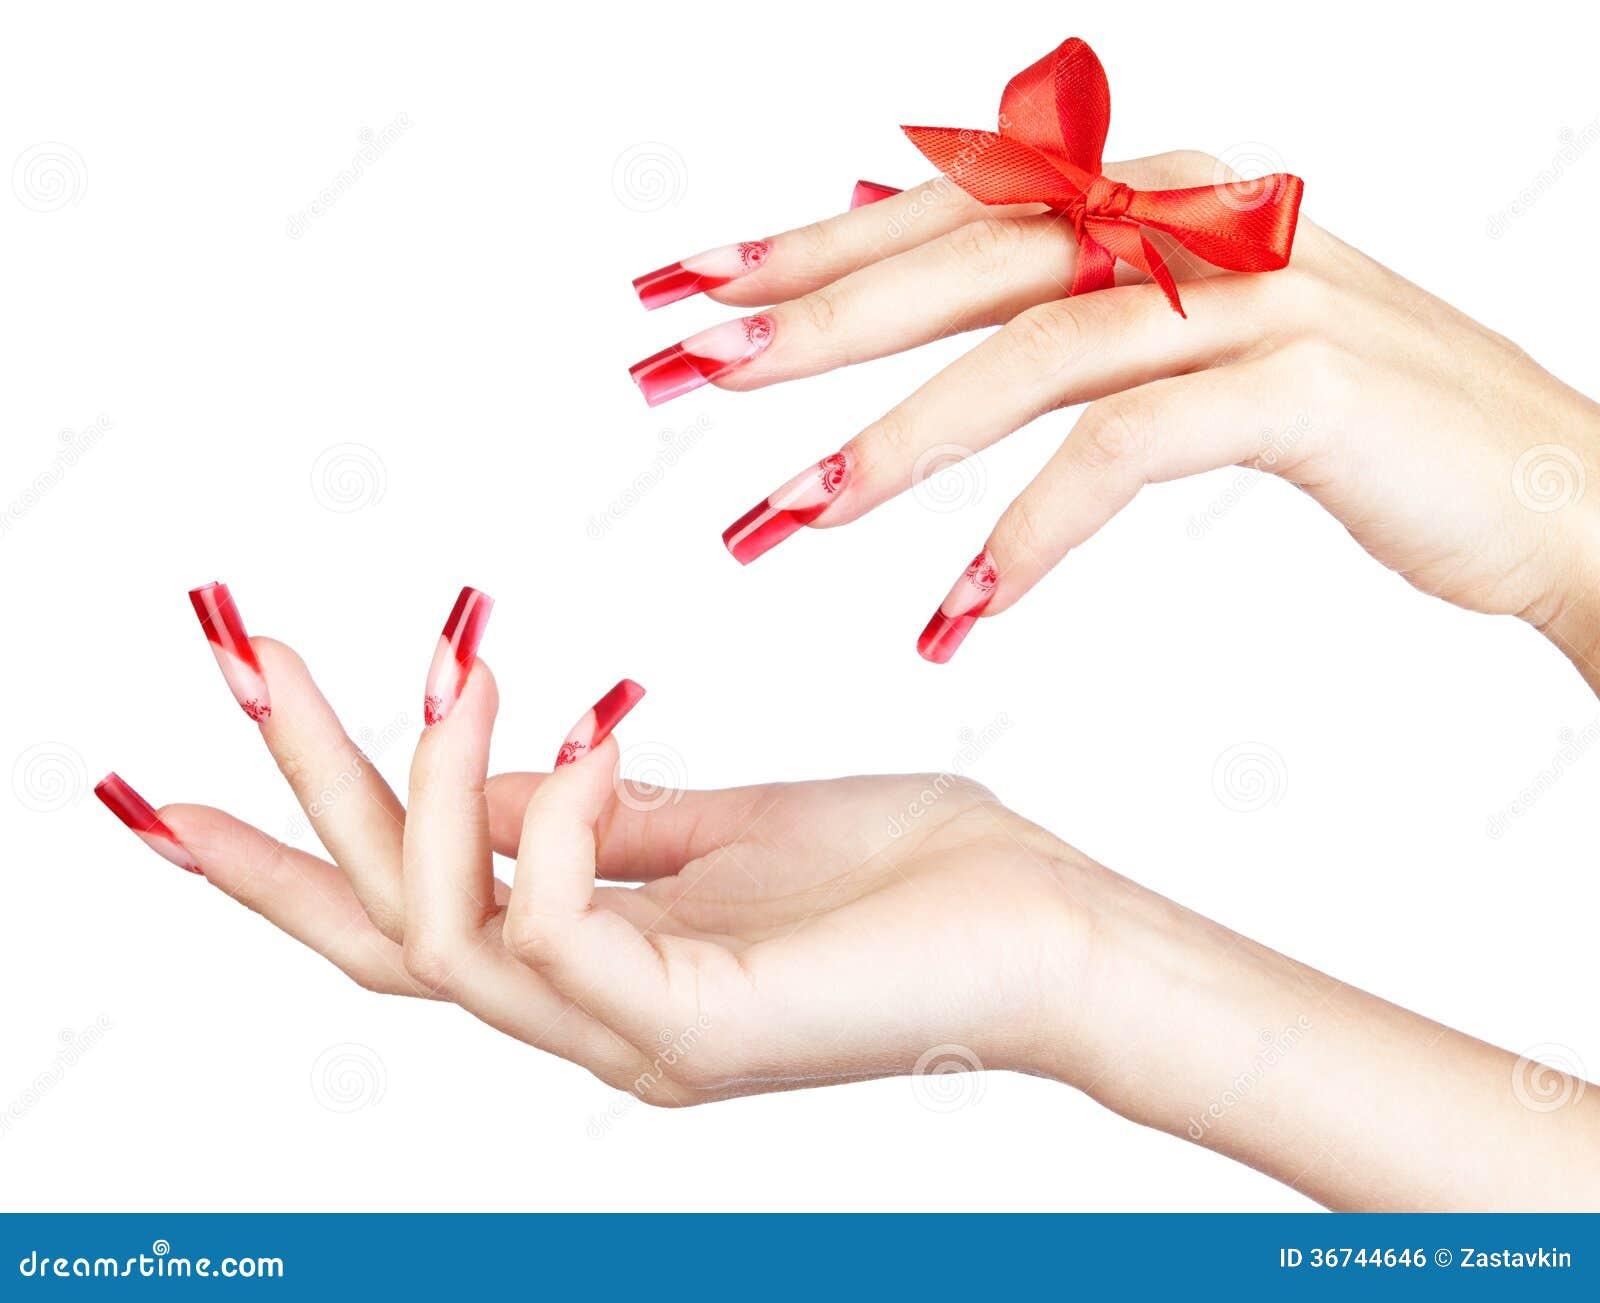 Acrylic nails manicure stock photo. Image of design, growing - 36744646